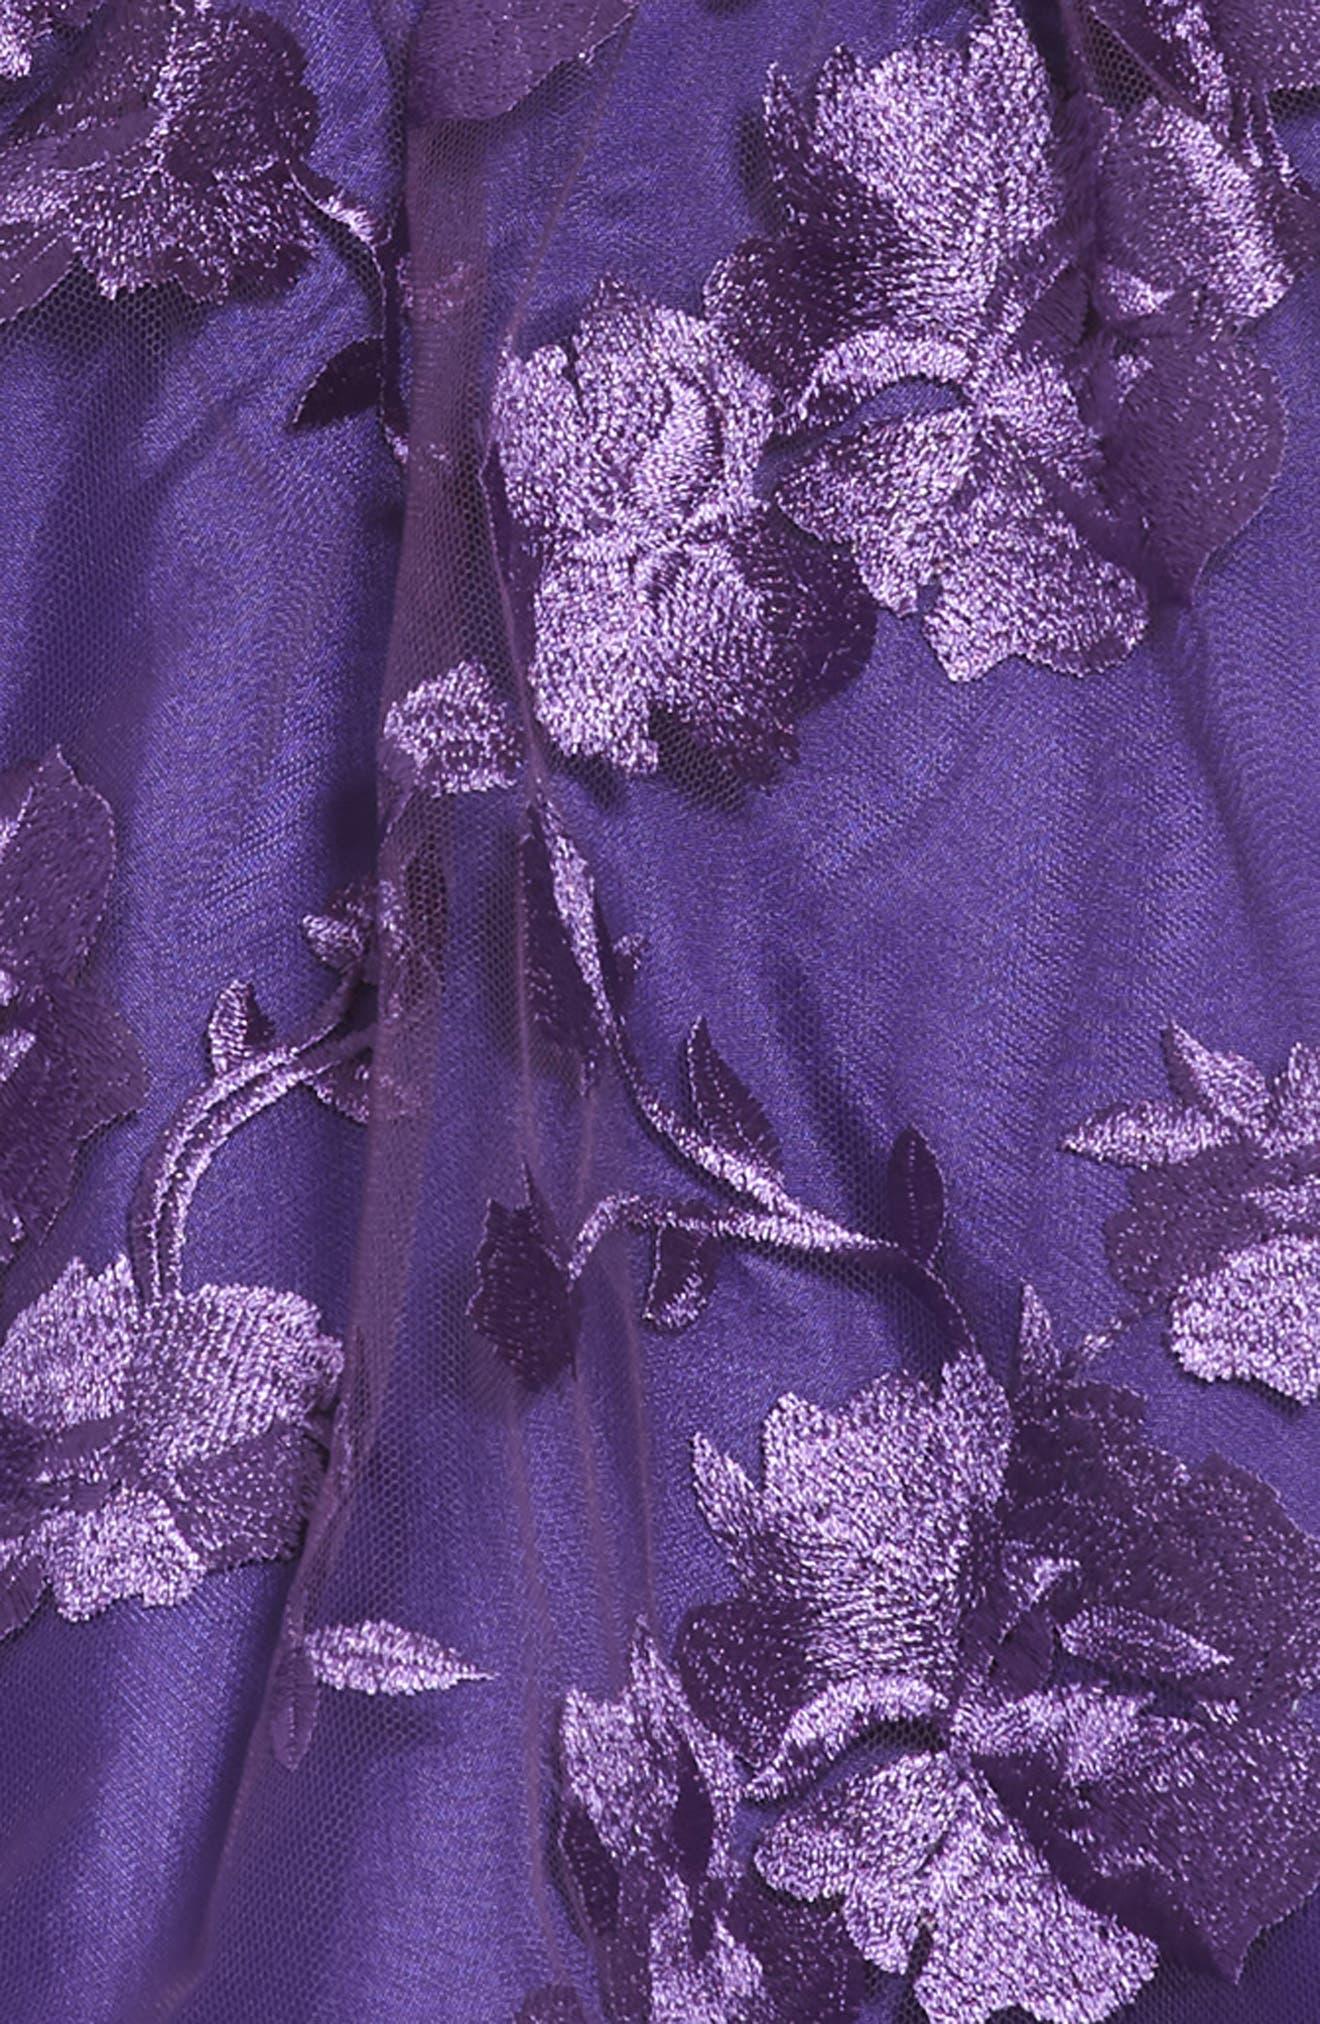 Floral Mesh Sleeveless Dress,                             Alternate thumbnail 3, color,                             Plum